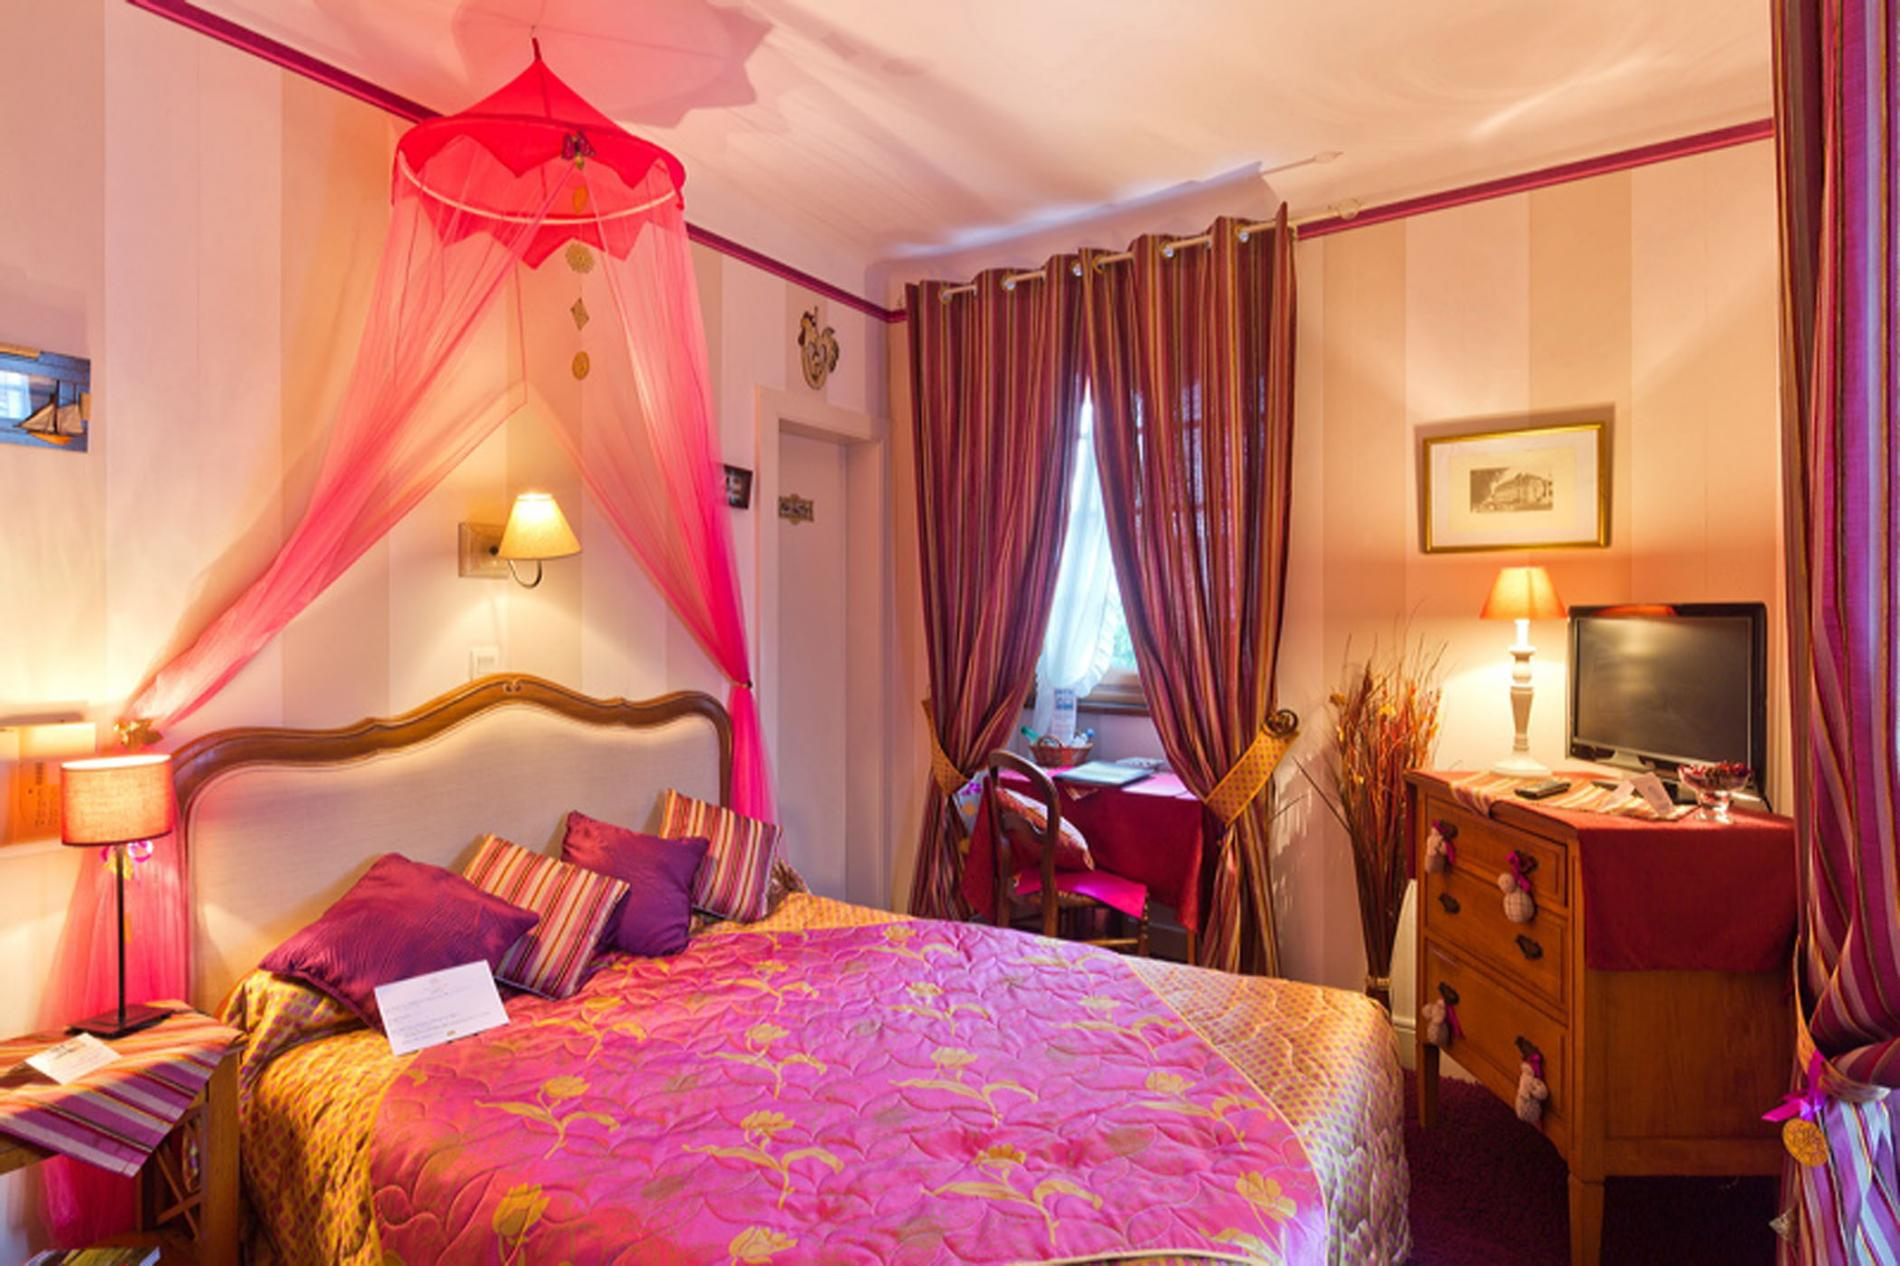 Chambres Hotel Evain Bord Lac Leman Hotel Les Cygnes ***